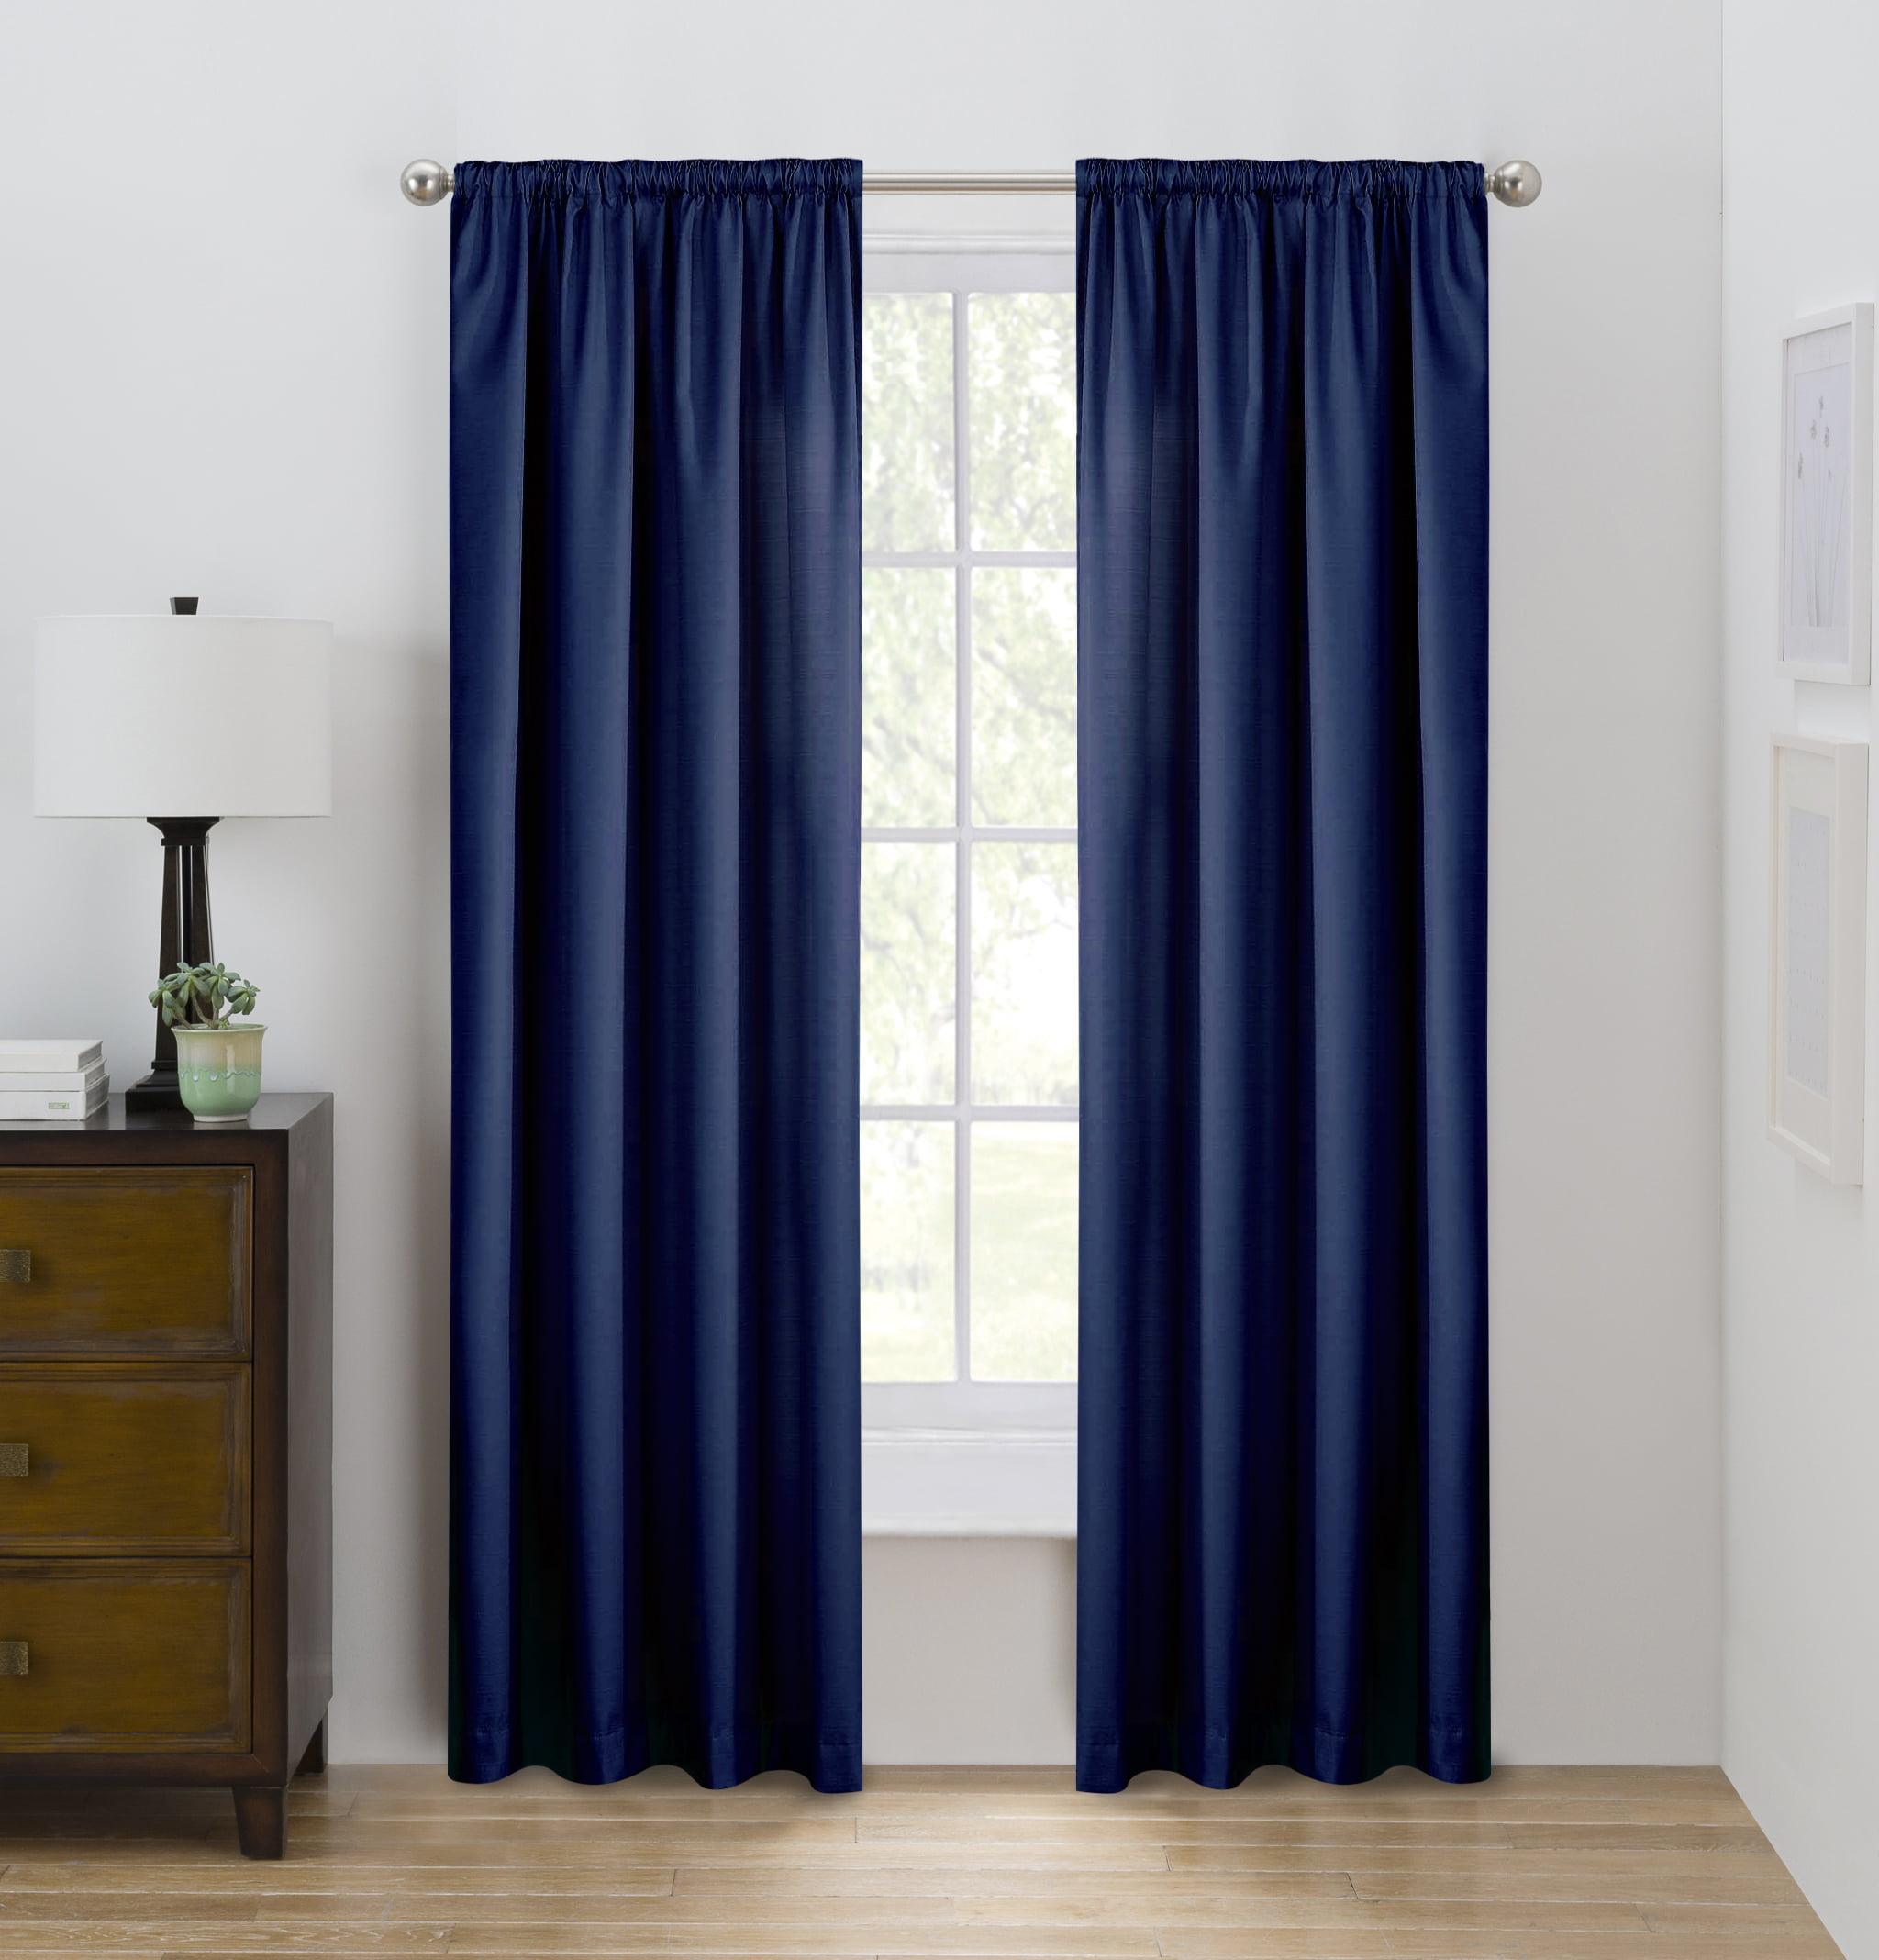 Eclipse Draft Stopper Solid Color Room Darkening Rod Pocket Single Curtain Panel Indigo Sky 42 X 84 Walmart Com Walmart Com